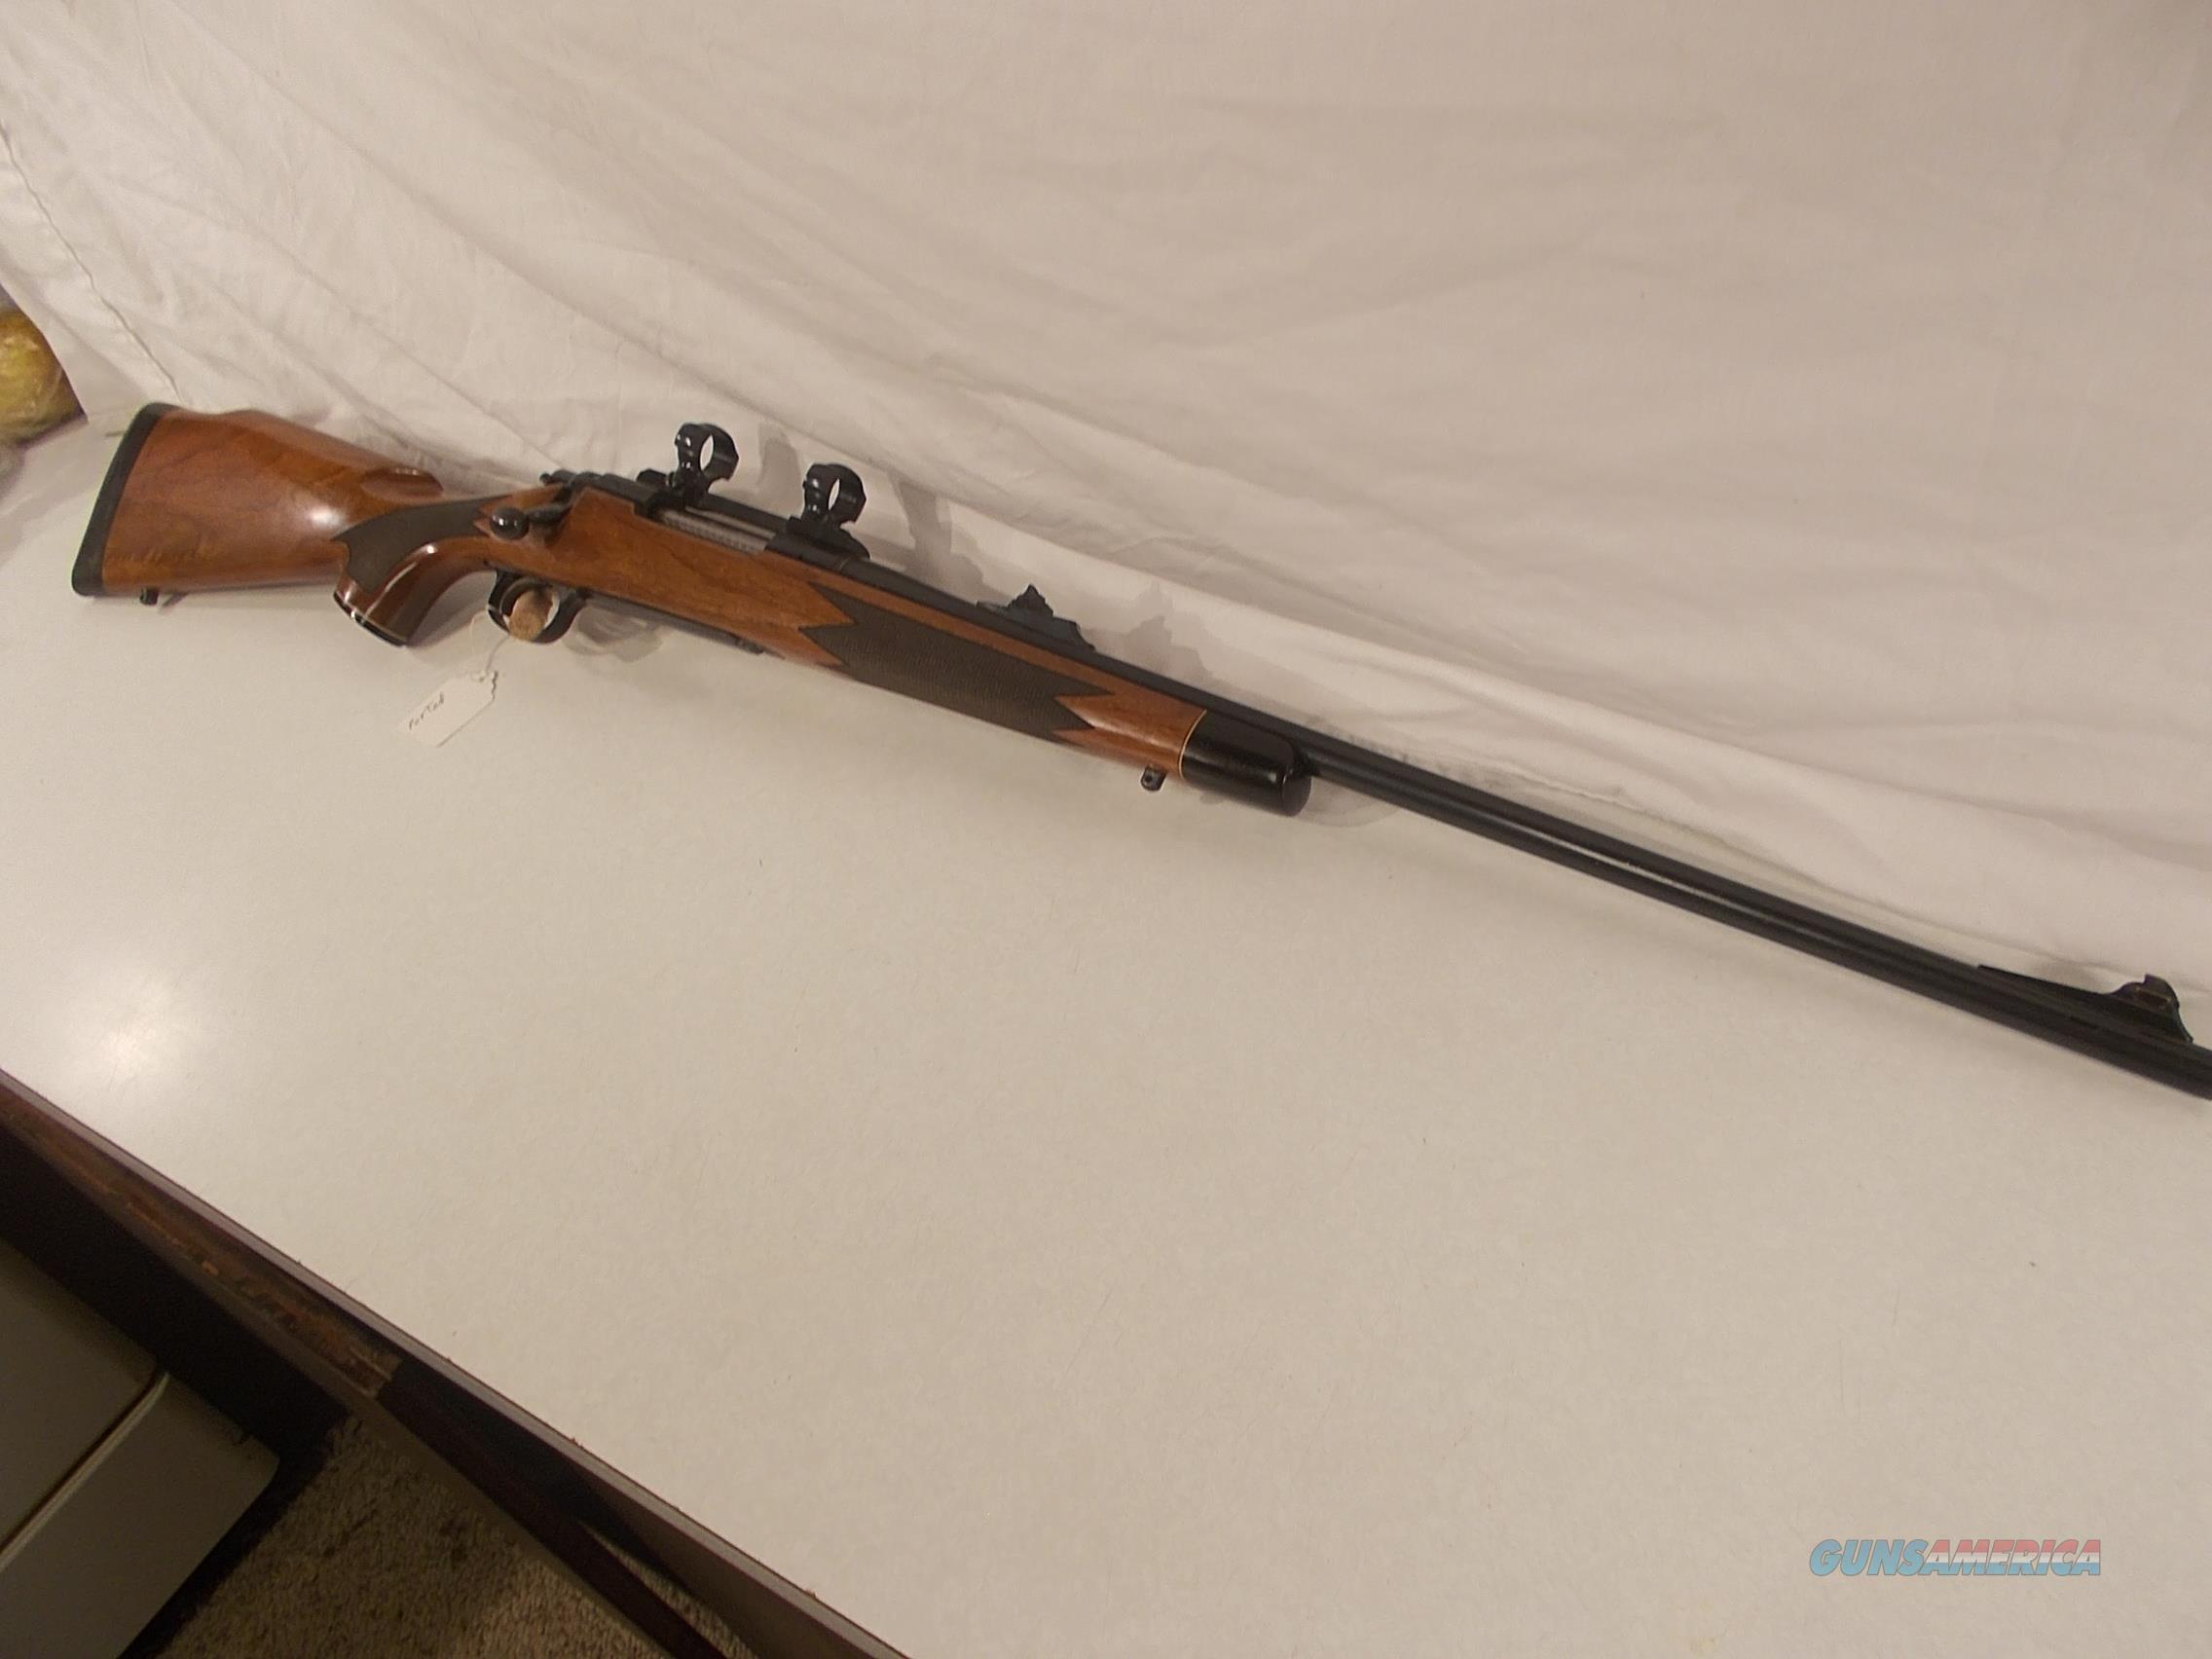 remington 700bdl 7mm mag ported  Guns > Rifles > Remington Rifles - Modern > Model 700 > Sporting